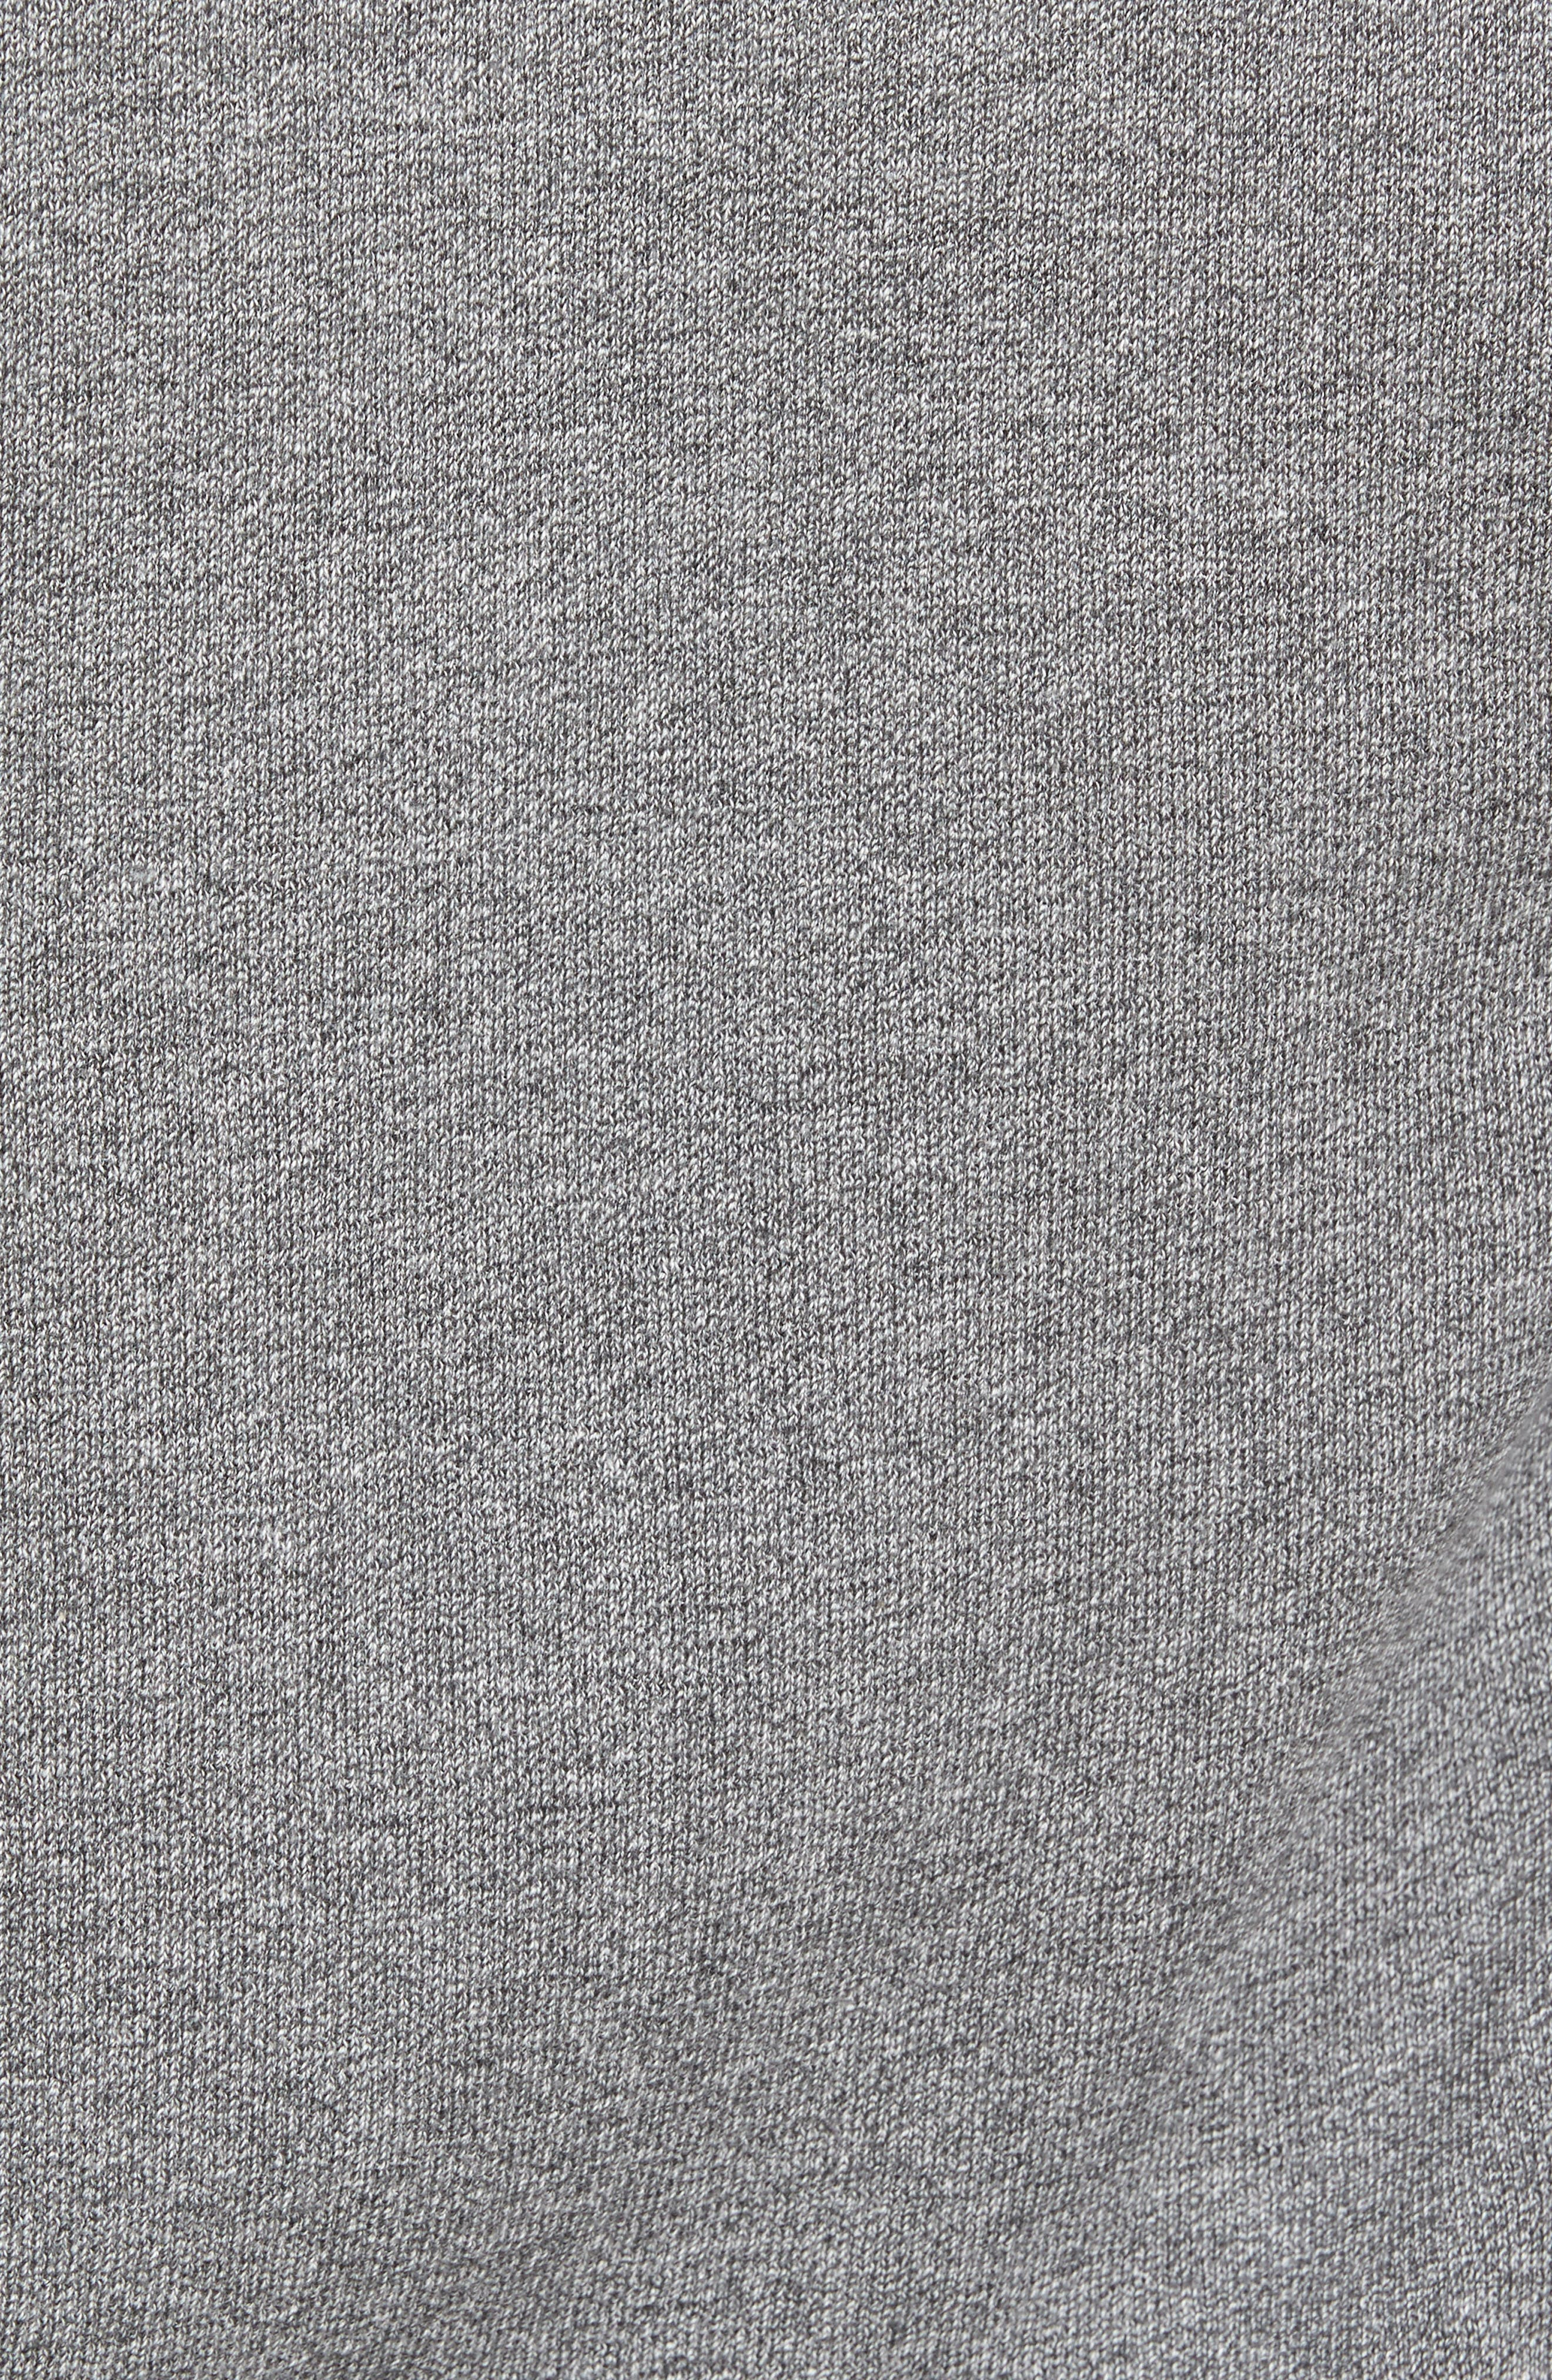 NFL Stitch of Liberty Embroidered Crewneck Sweatshirt,                             Alternate thumbnail 150, color,